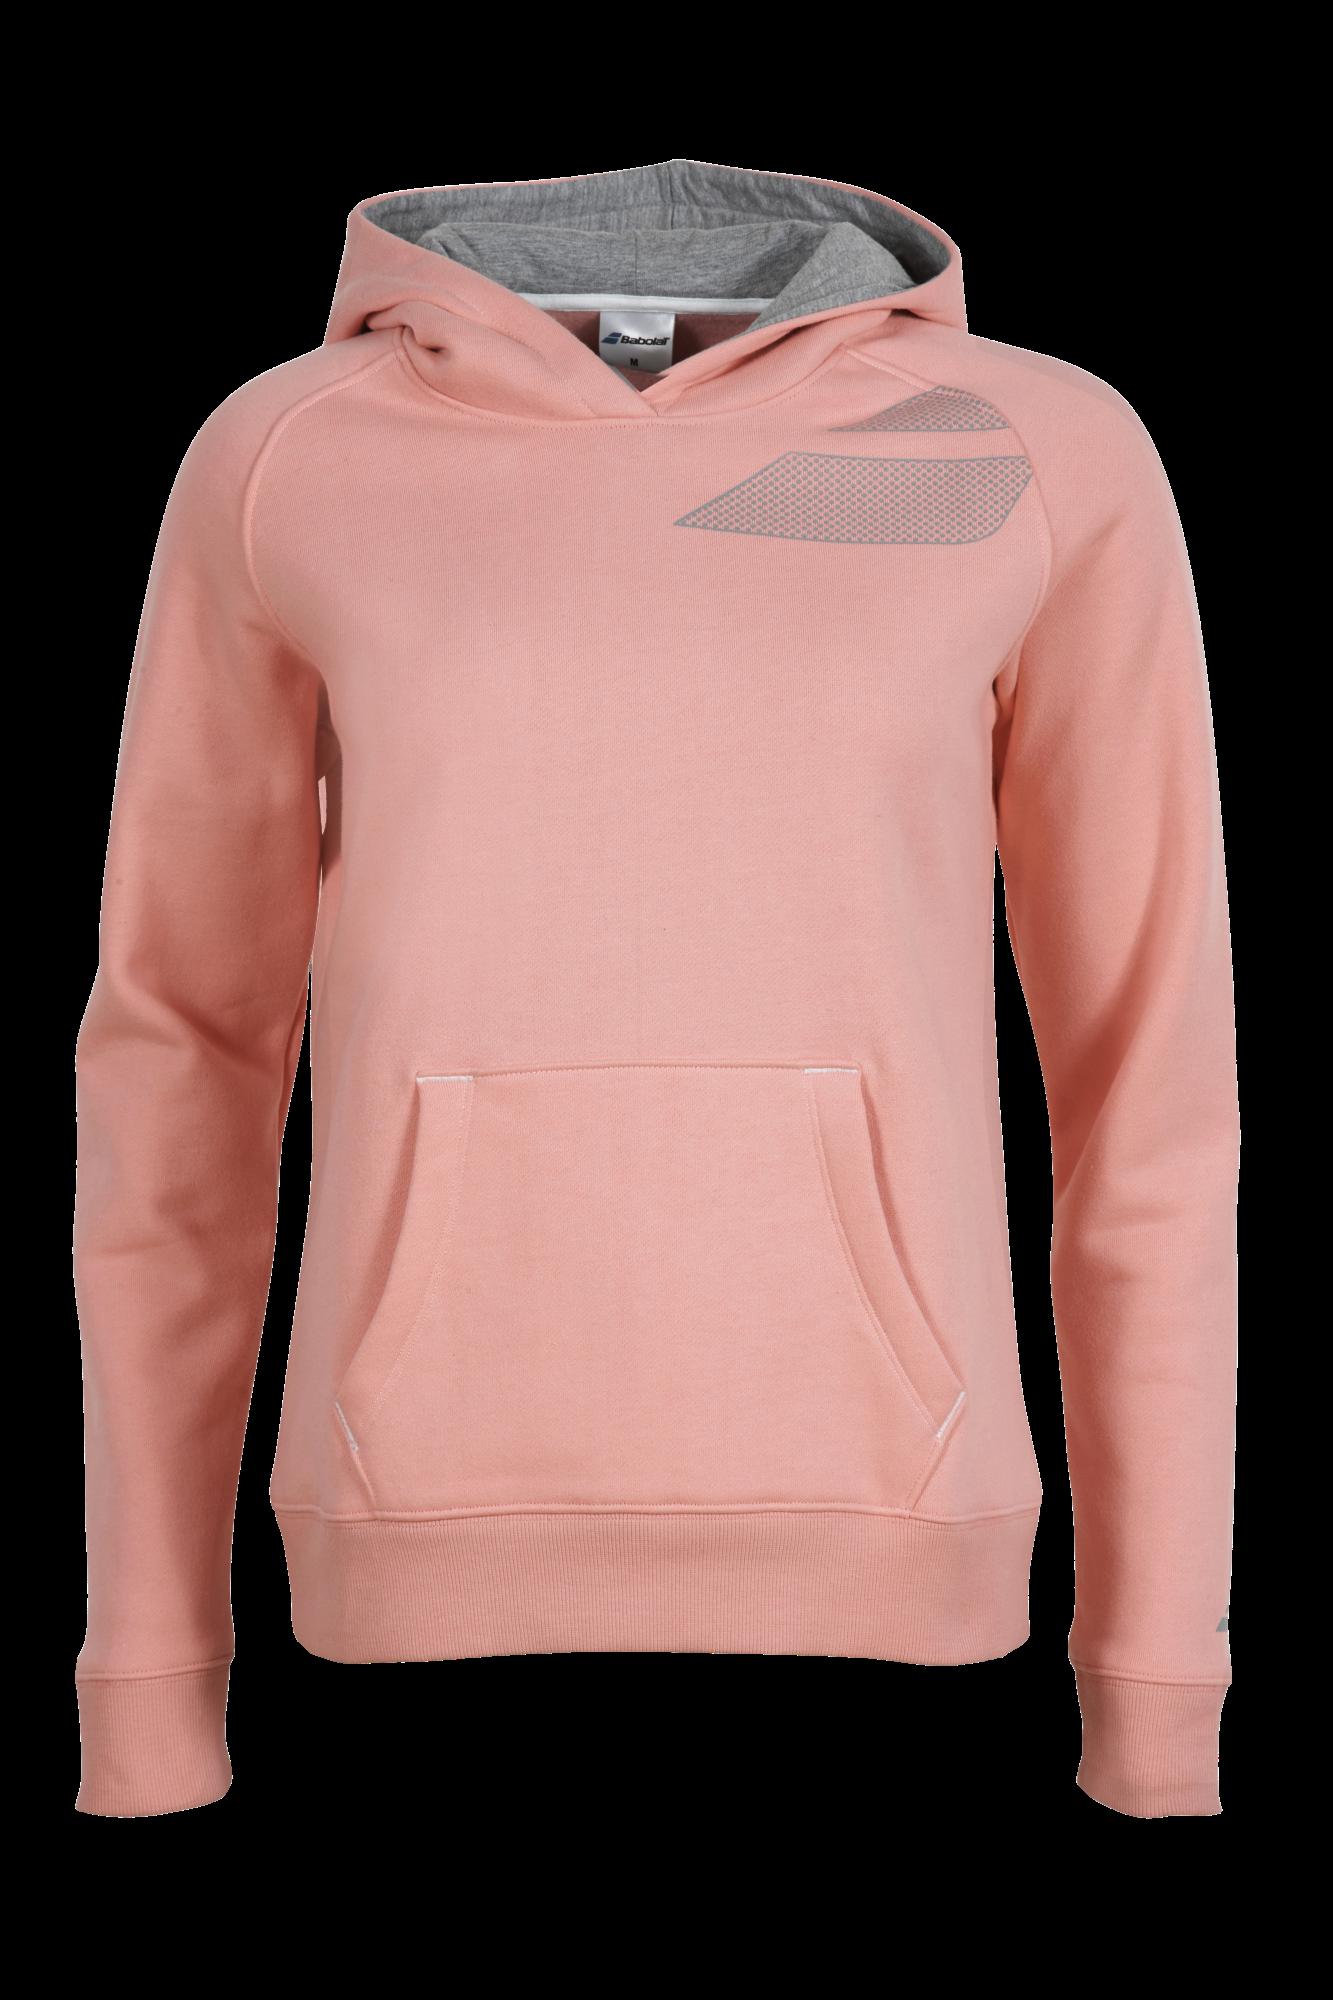 Babolat Sweat Training Girl Pink 2015 128